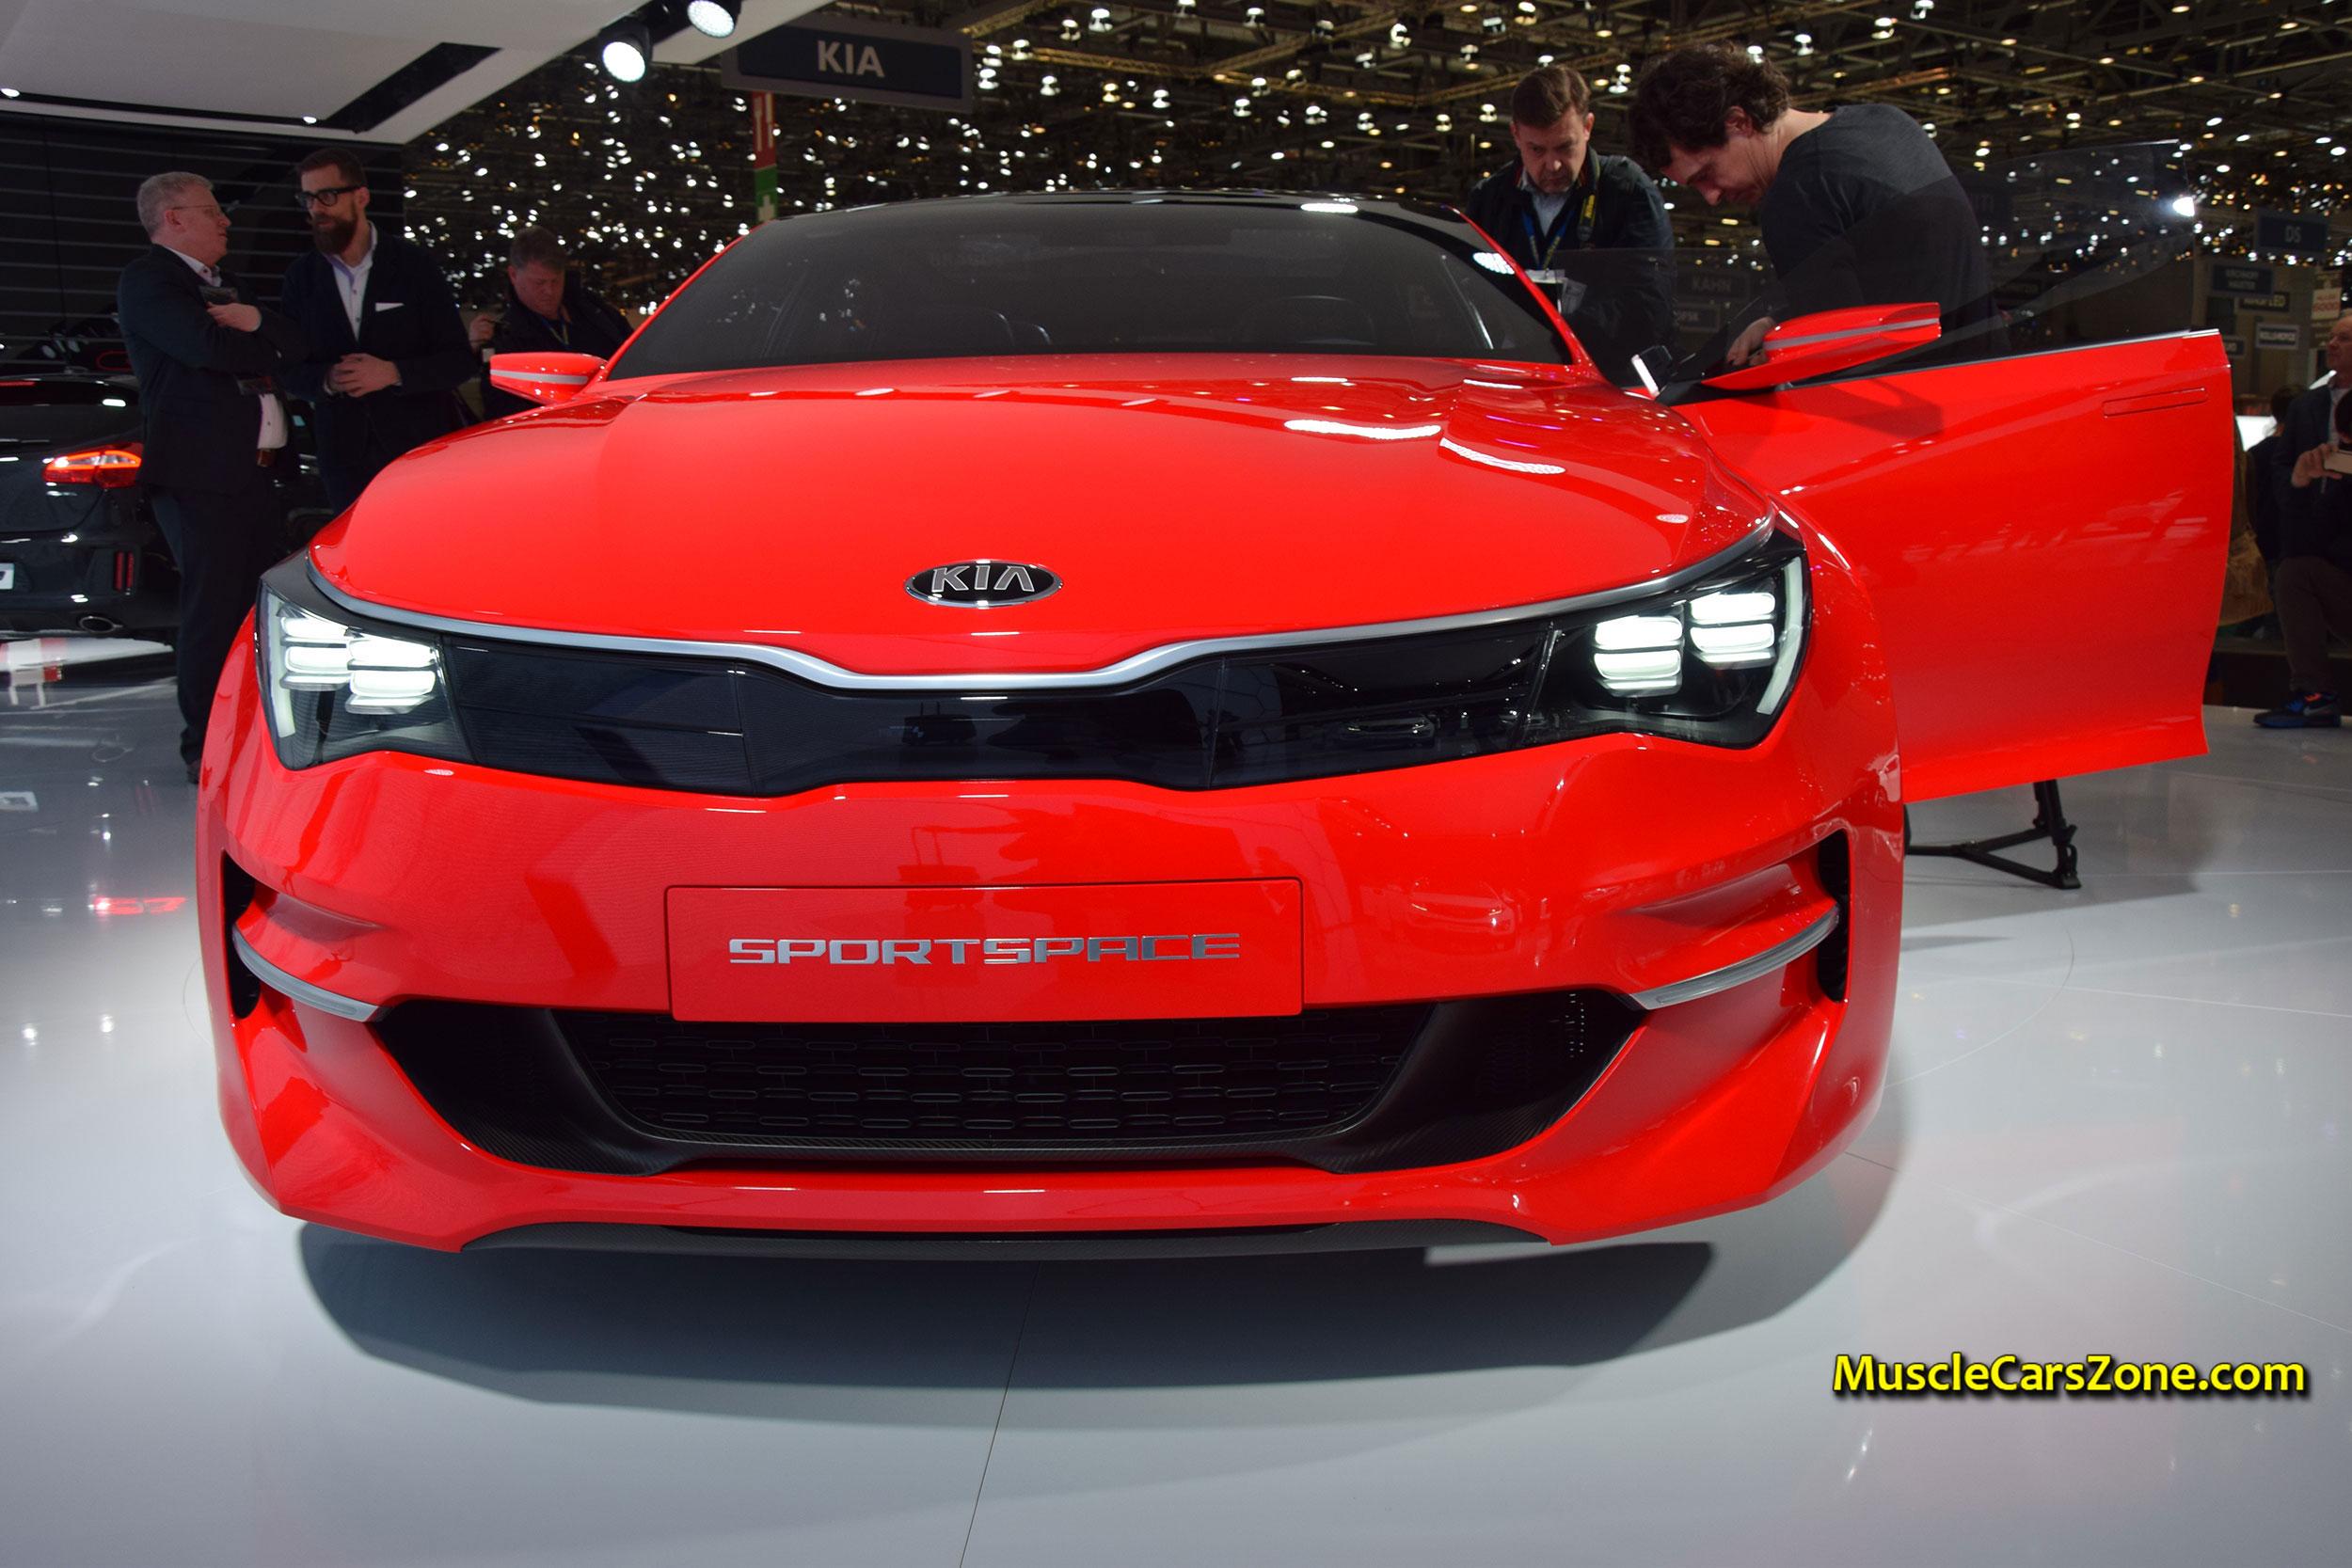 2016 Kia Sportspace Concept Car 2015 Geneva Motor Show